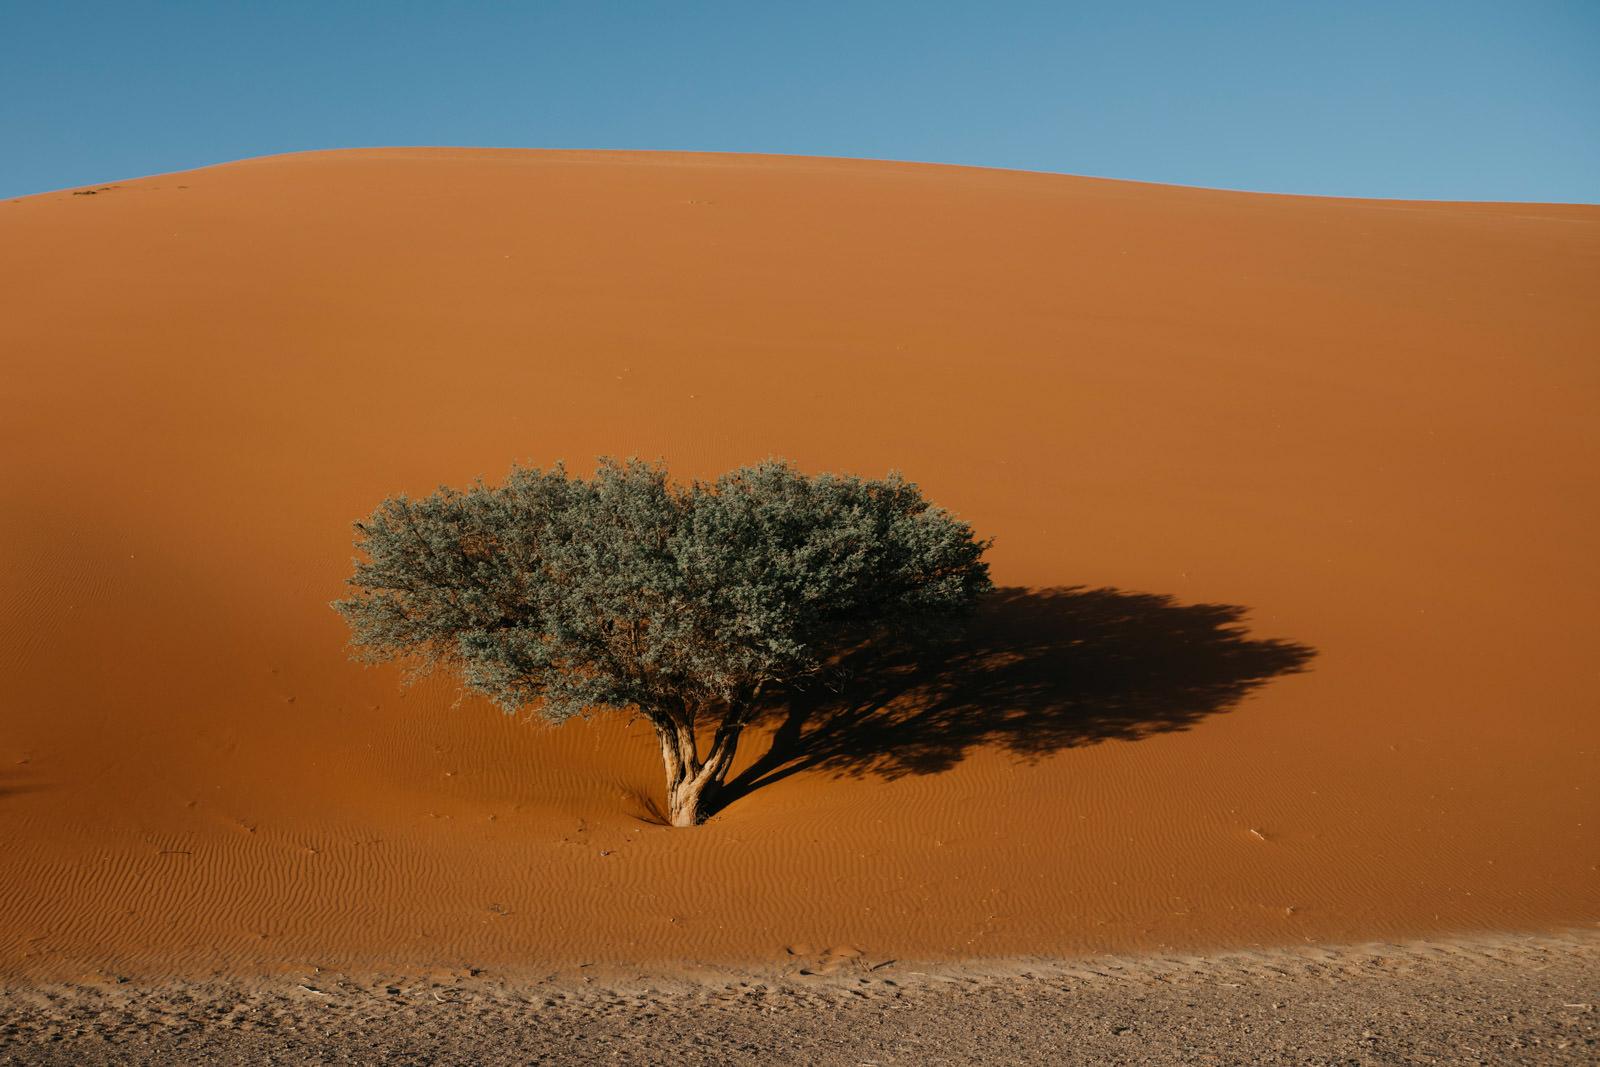 namibia_trip_rooftent_camping_roadtrip (14 von 26).jpg